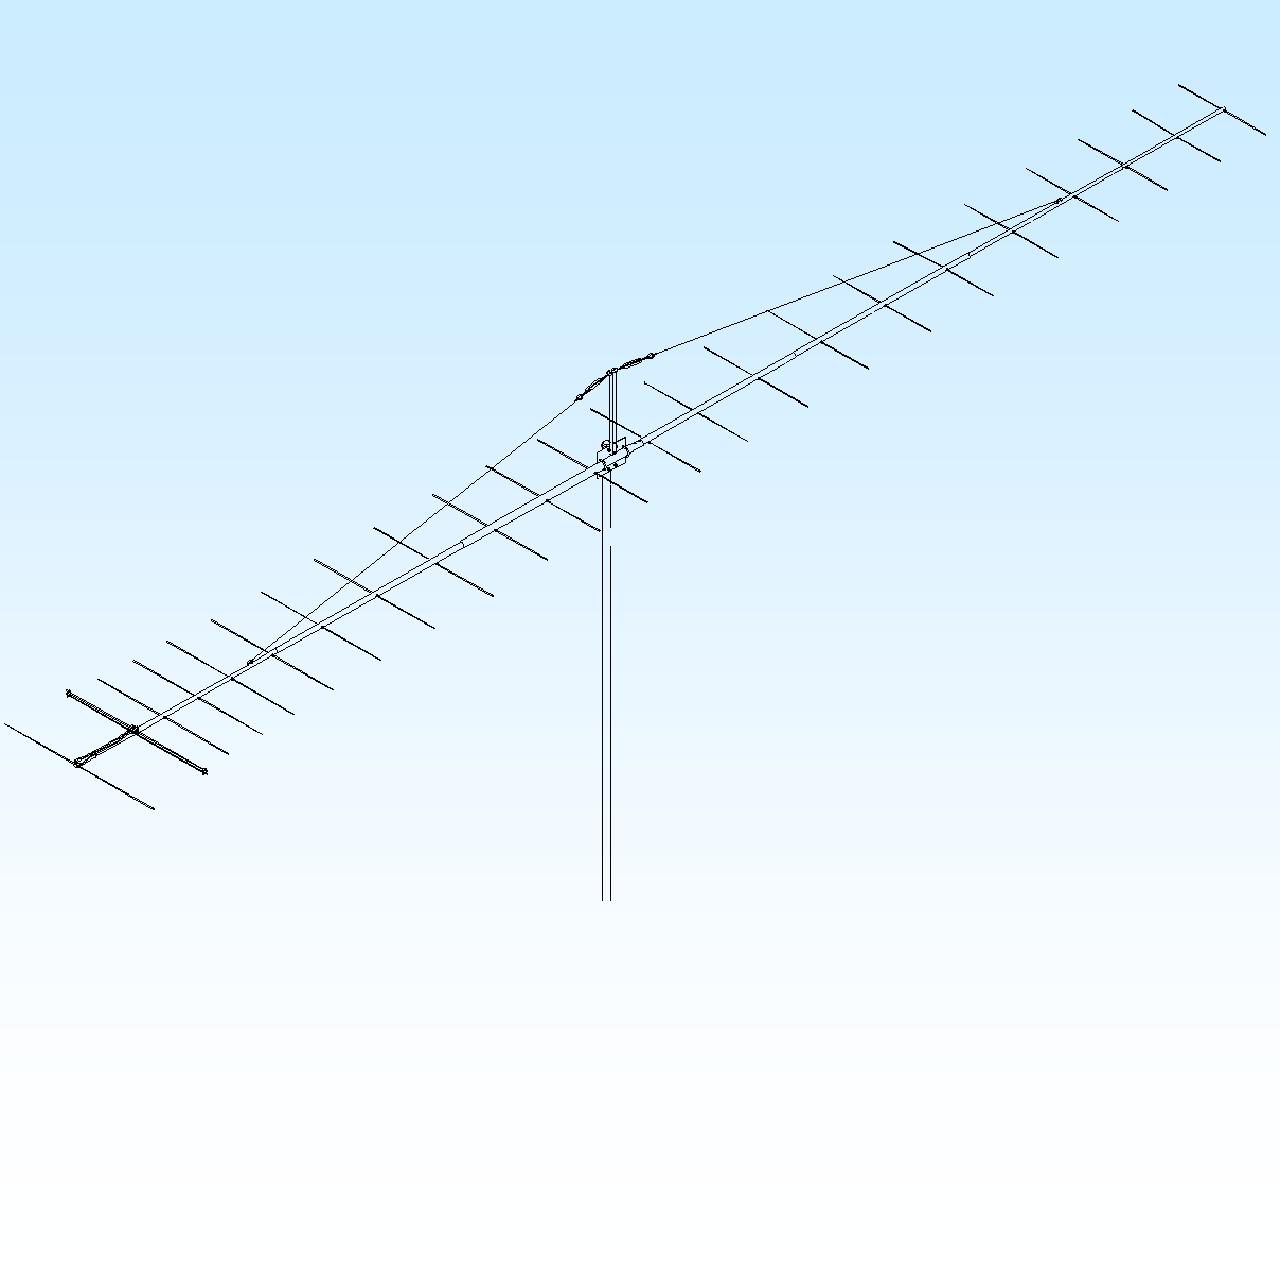 222-7WL, 222-226 MHz